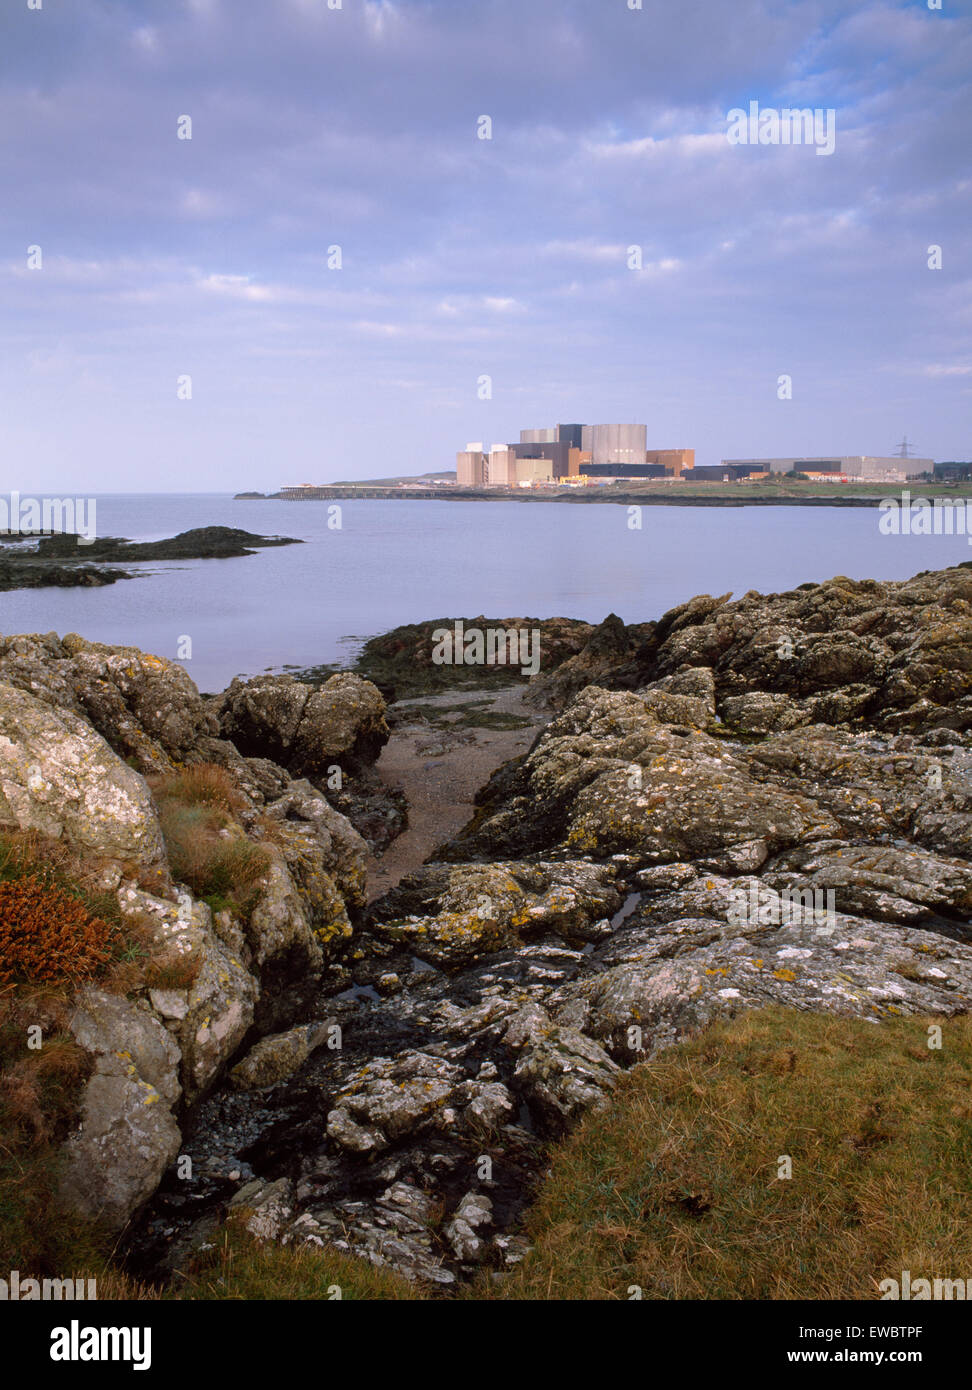 Wylfa Nuclear Power Station from the coastal path near Cemlyn Bay. - Stock Image